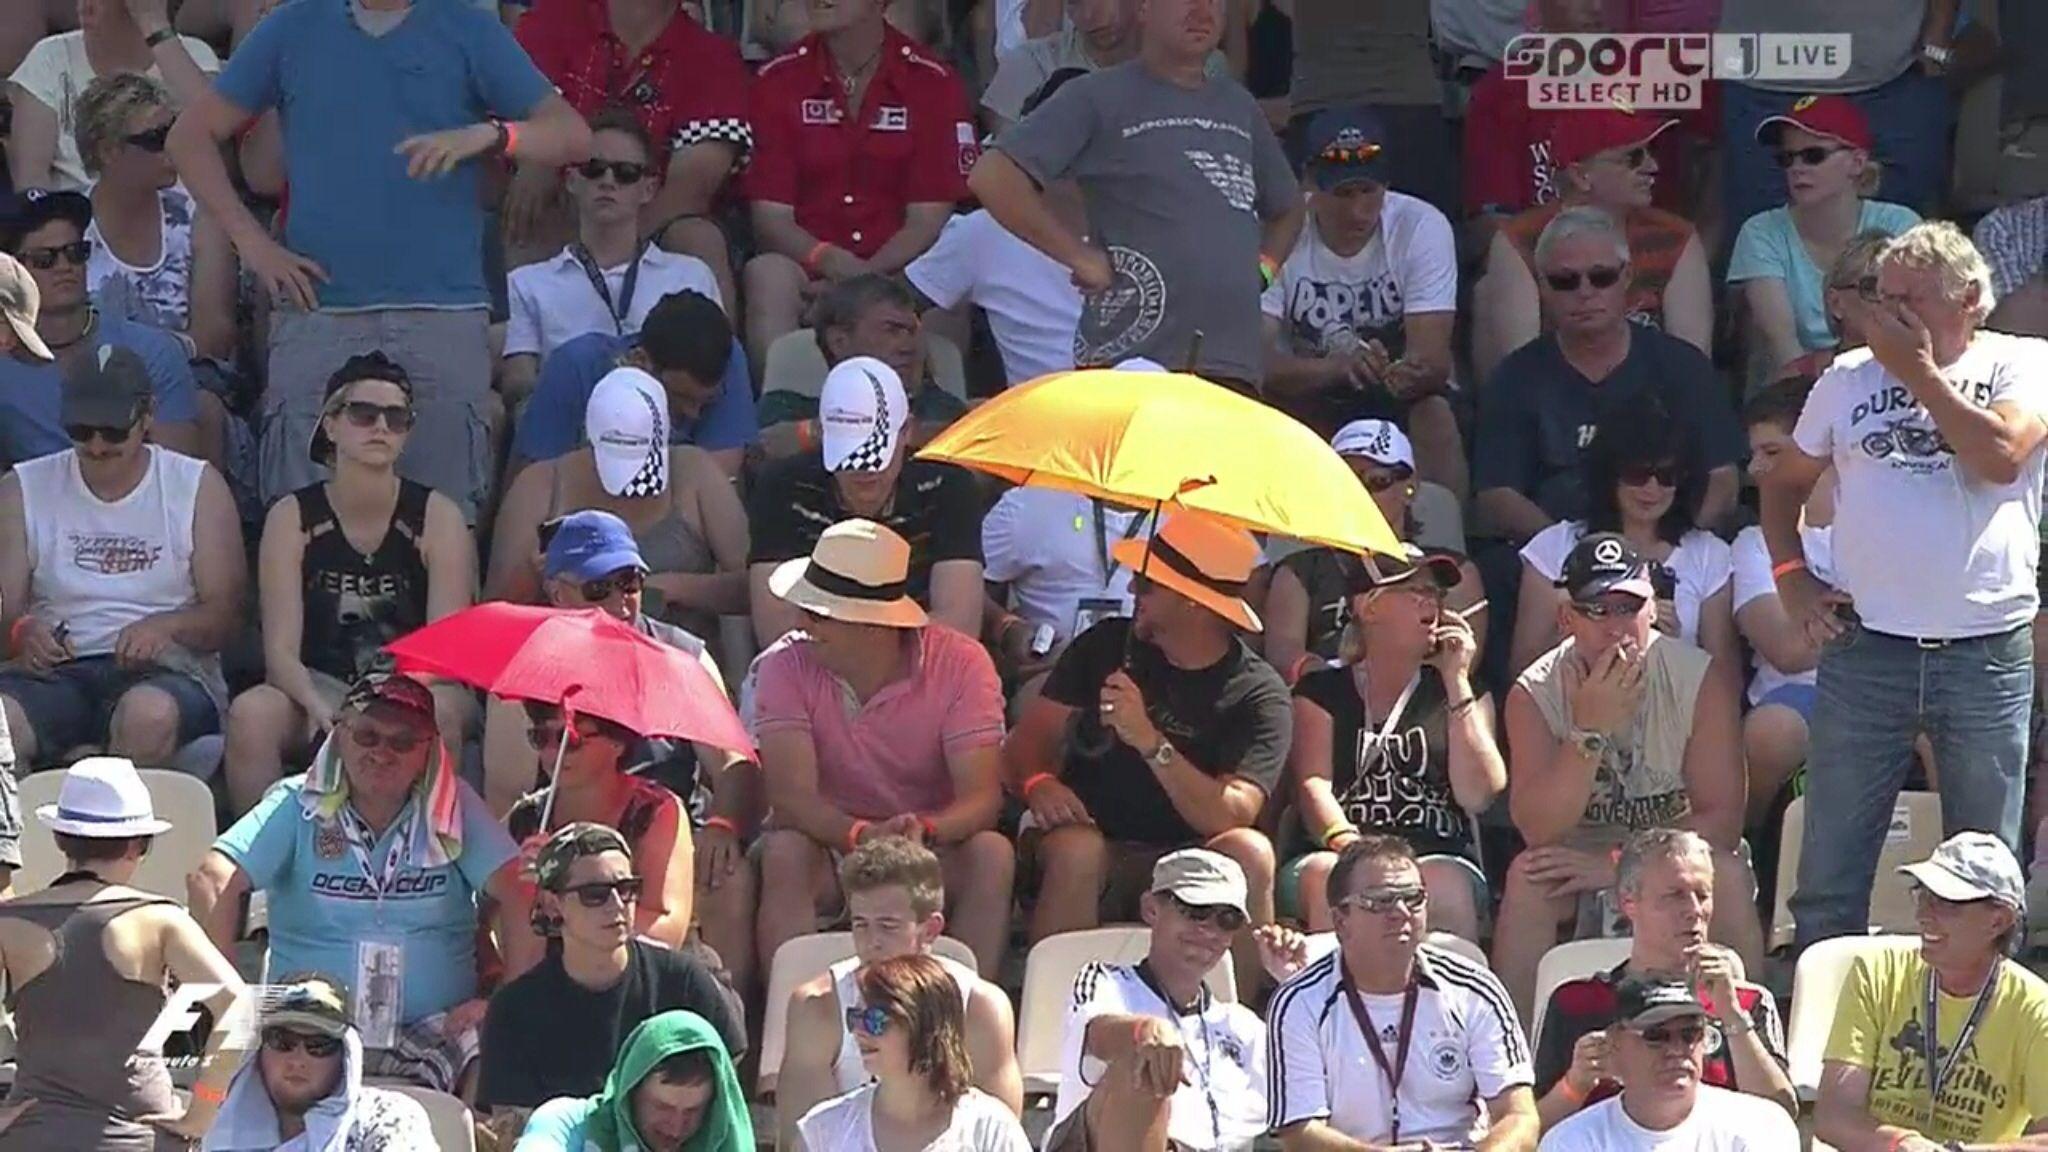 Germany Grand Prix 2014